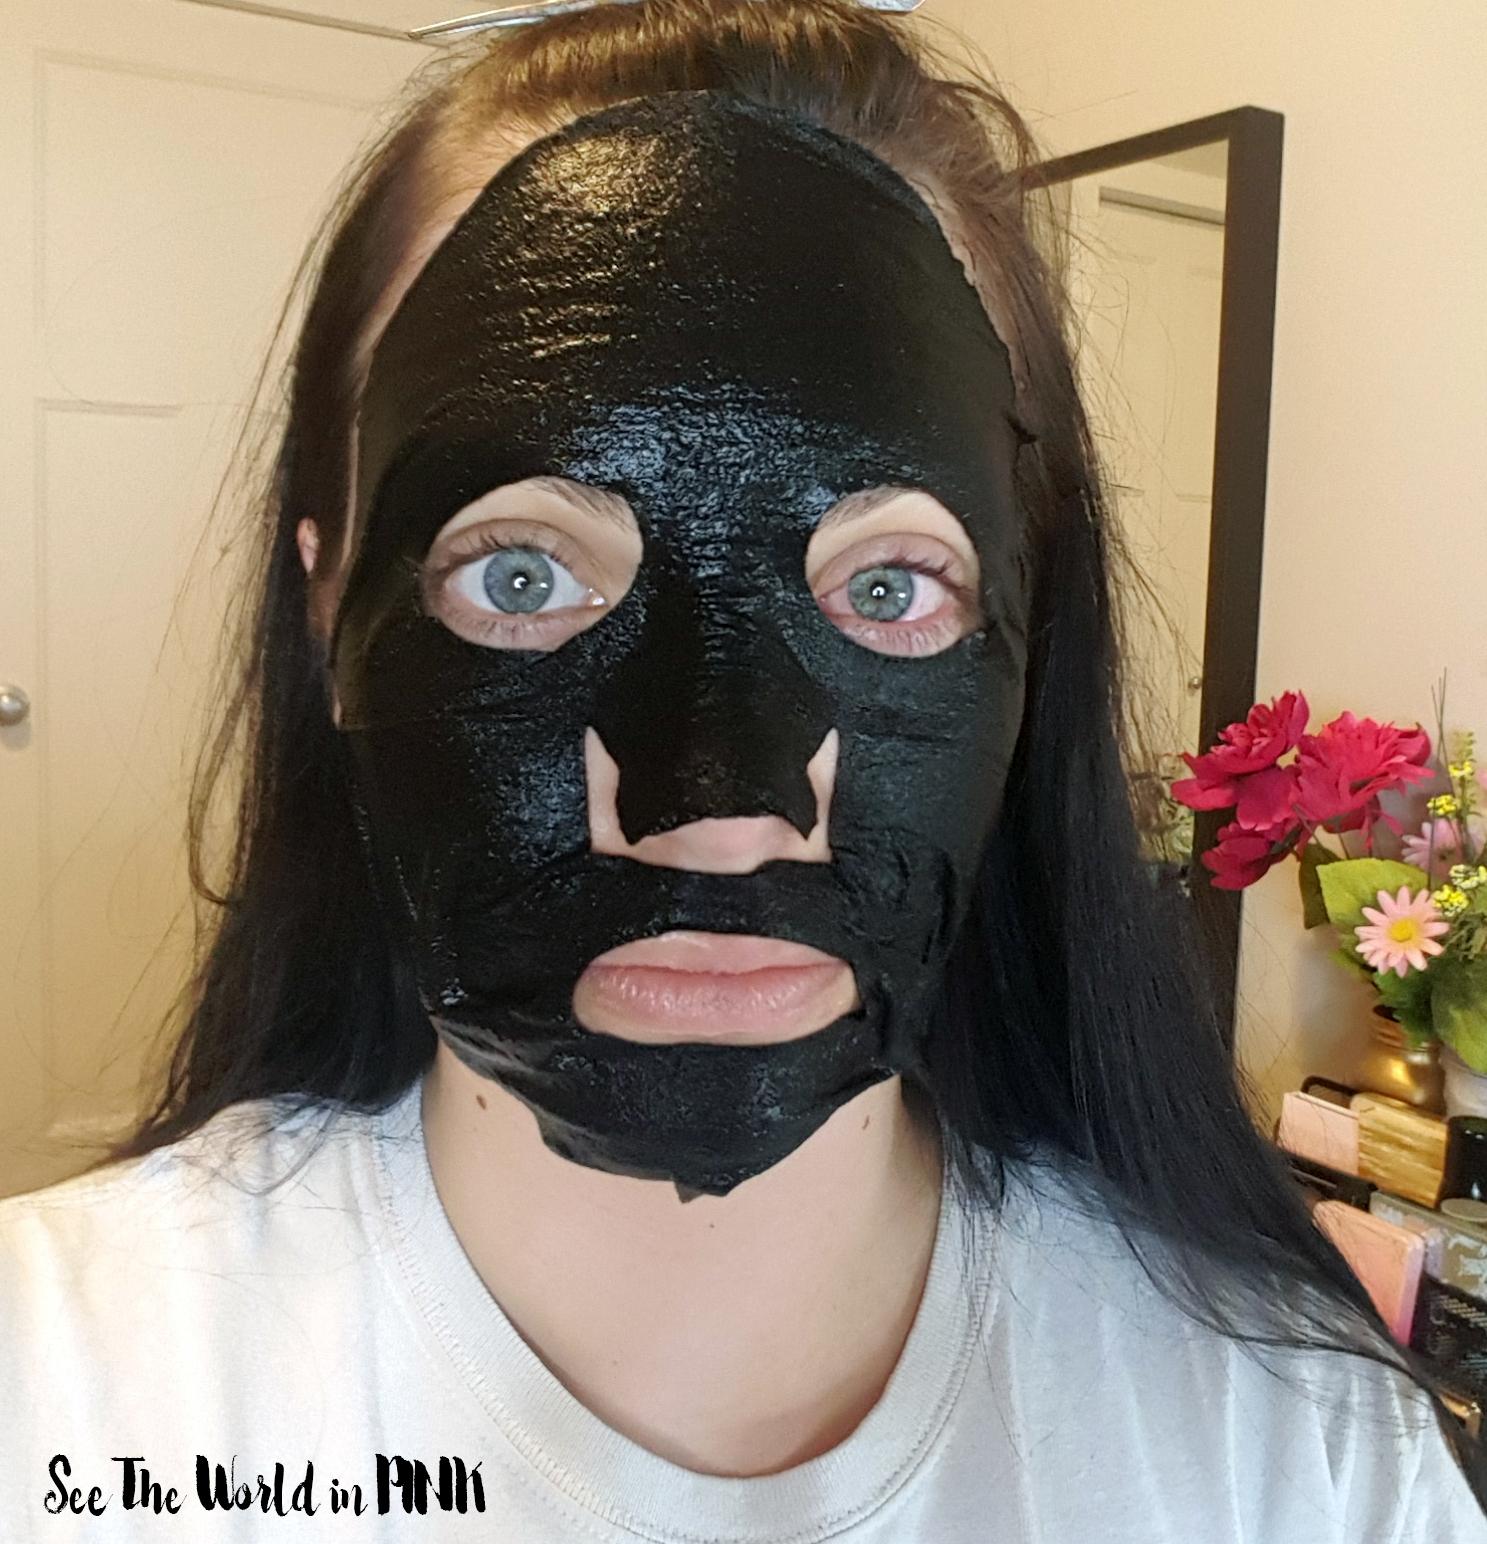 #CBBGetsSheetFaced Sexylook Mask